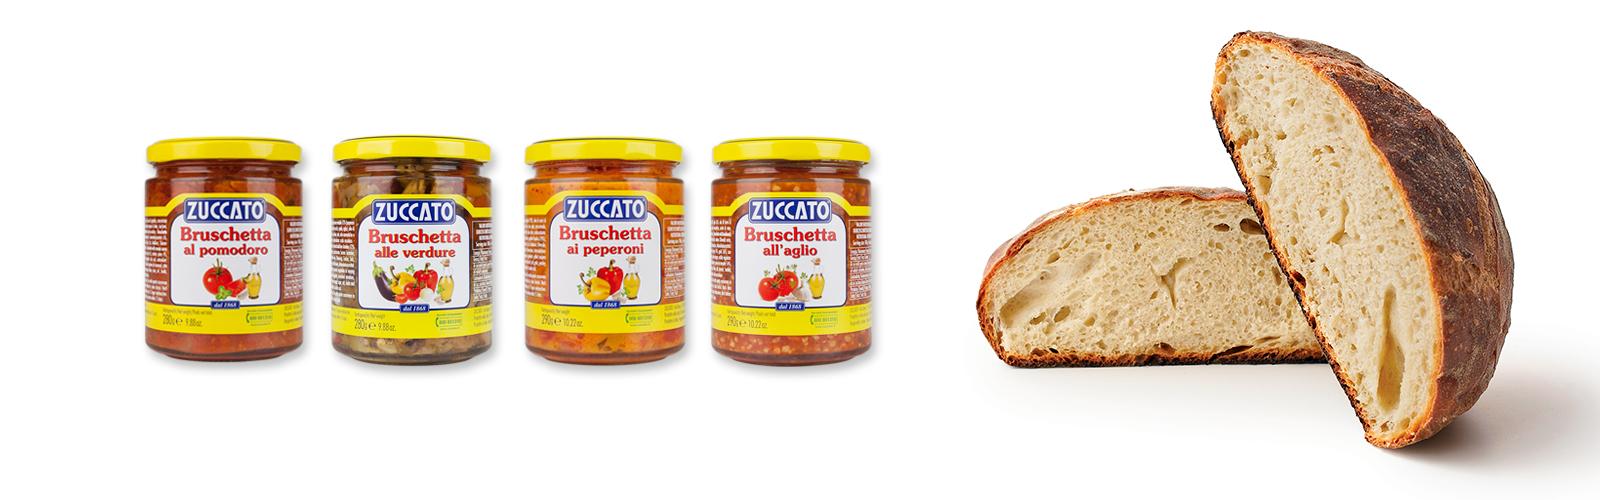 Bruschette Zuccato